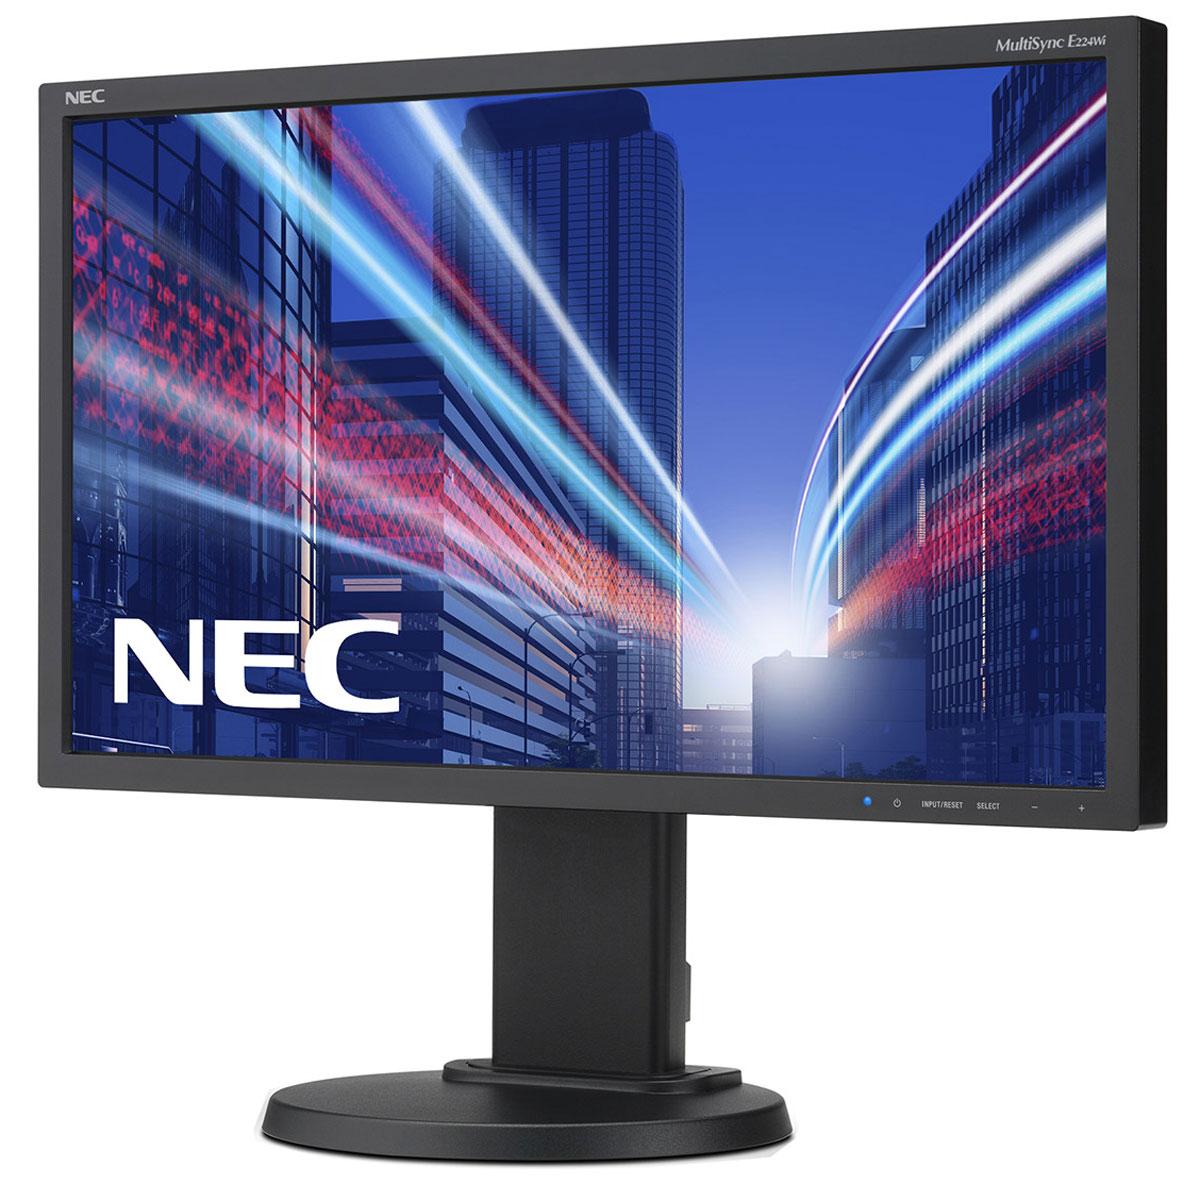 NEC E224Wi-BK, Black монитор монитор 22 nec ea223wm bk черный ea223wm bk